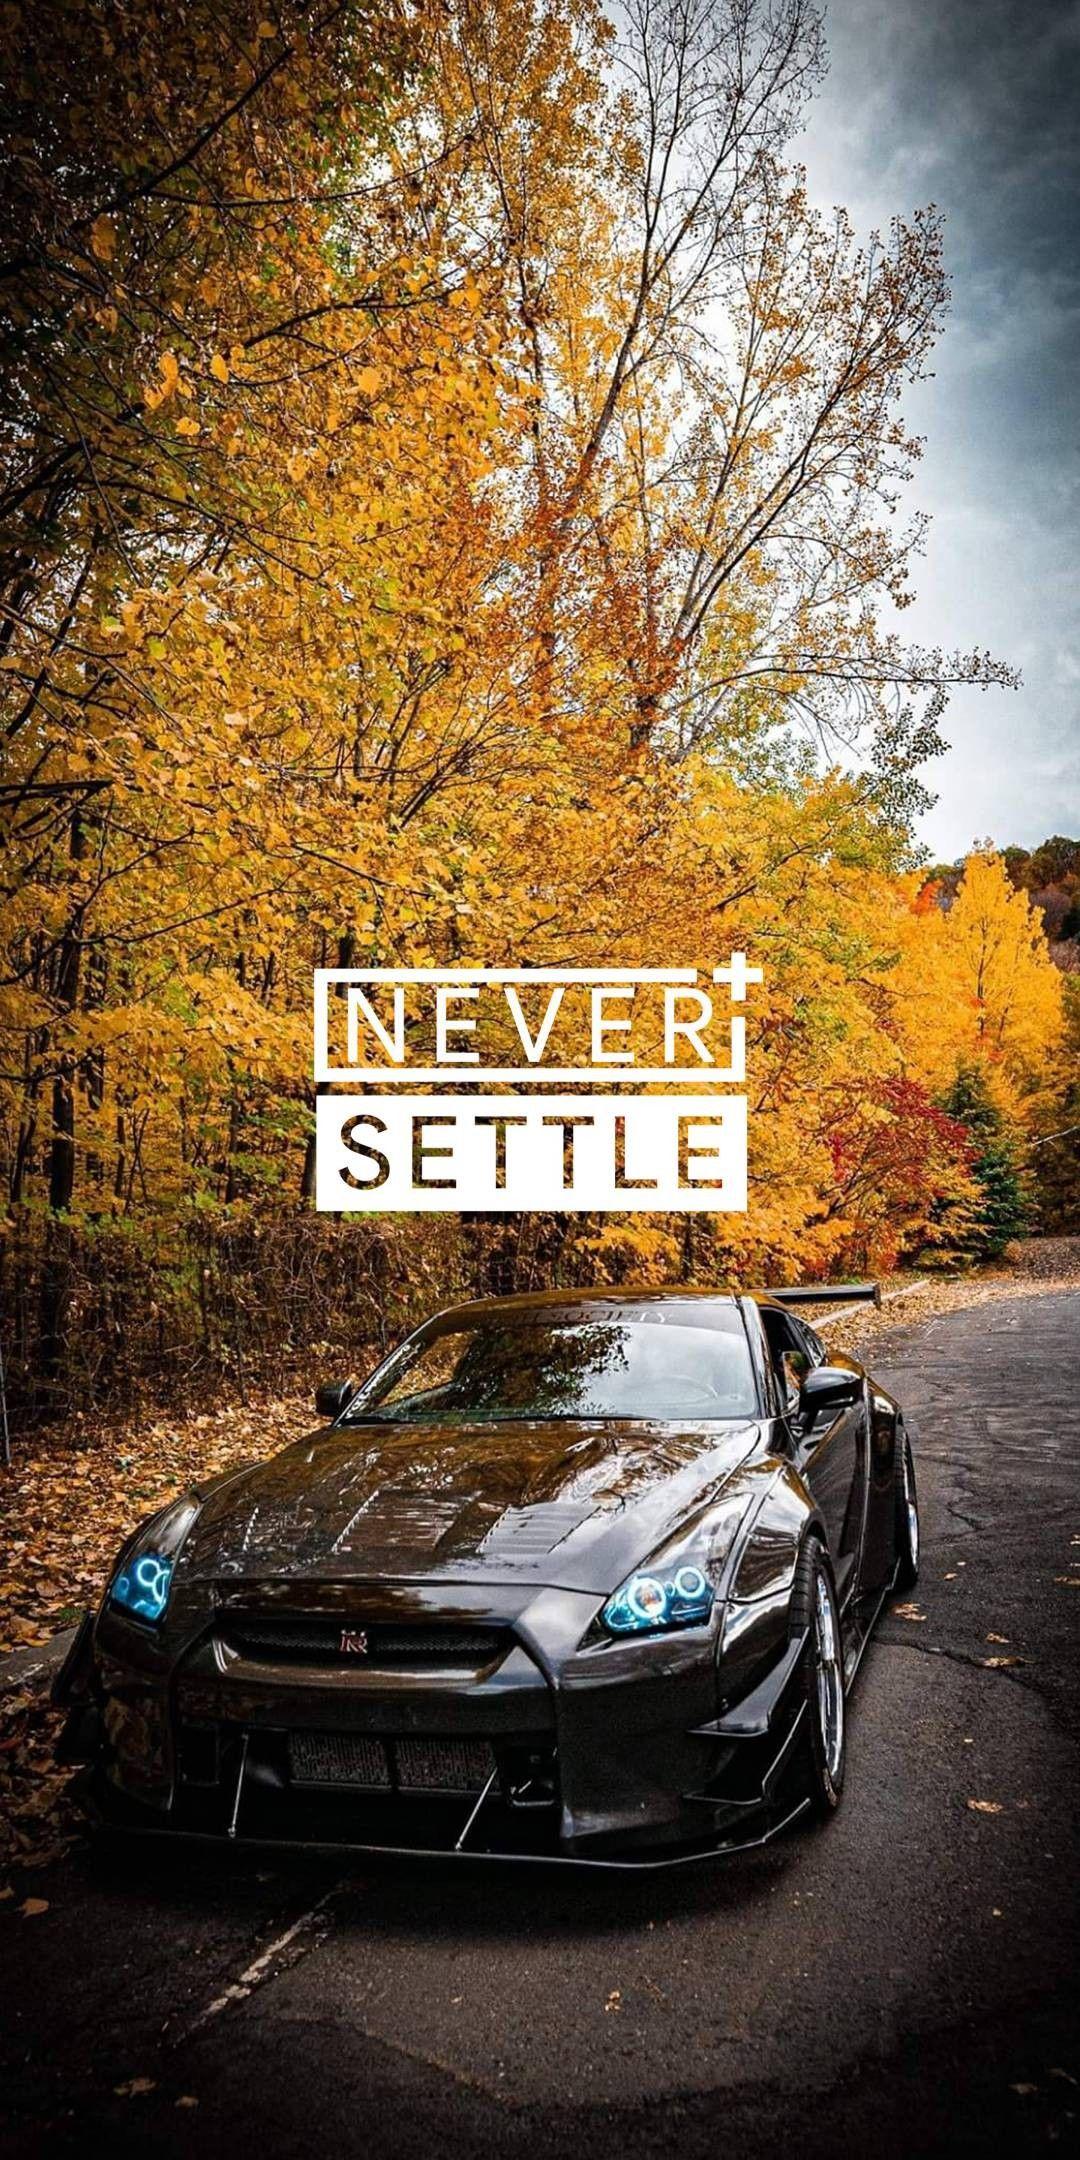 Pin By Atiff On Never Settle Never Settle Wallpapers Oneplus Wallpapers Never Settle Wallpapers Full Hd